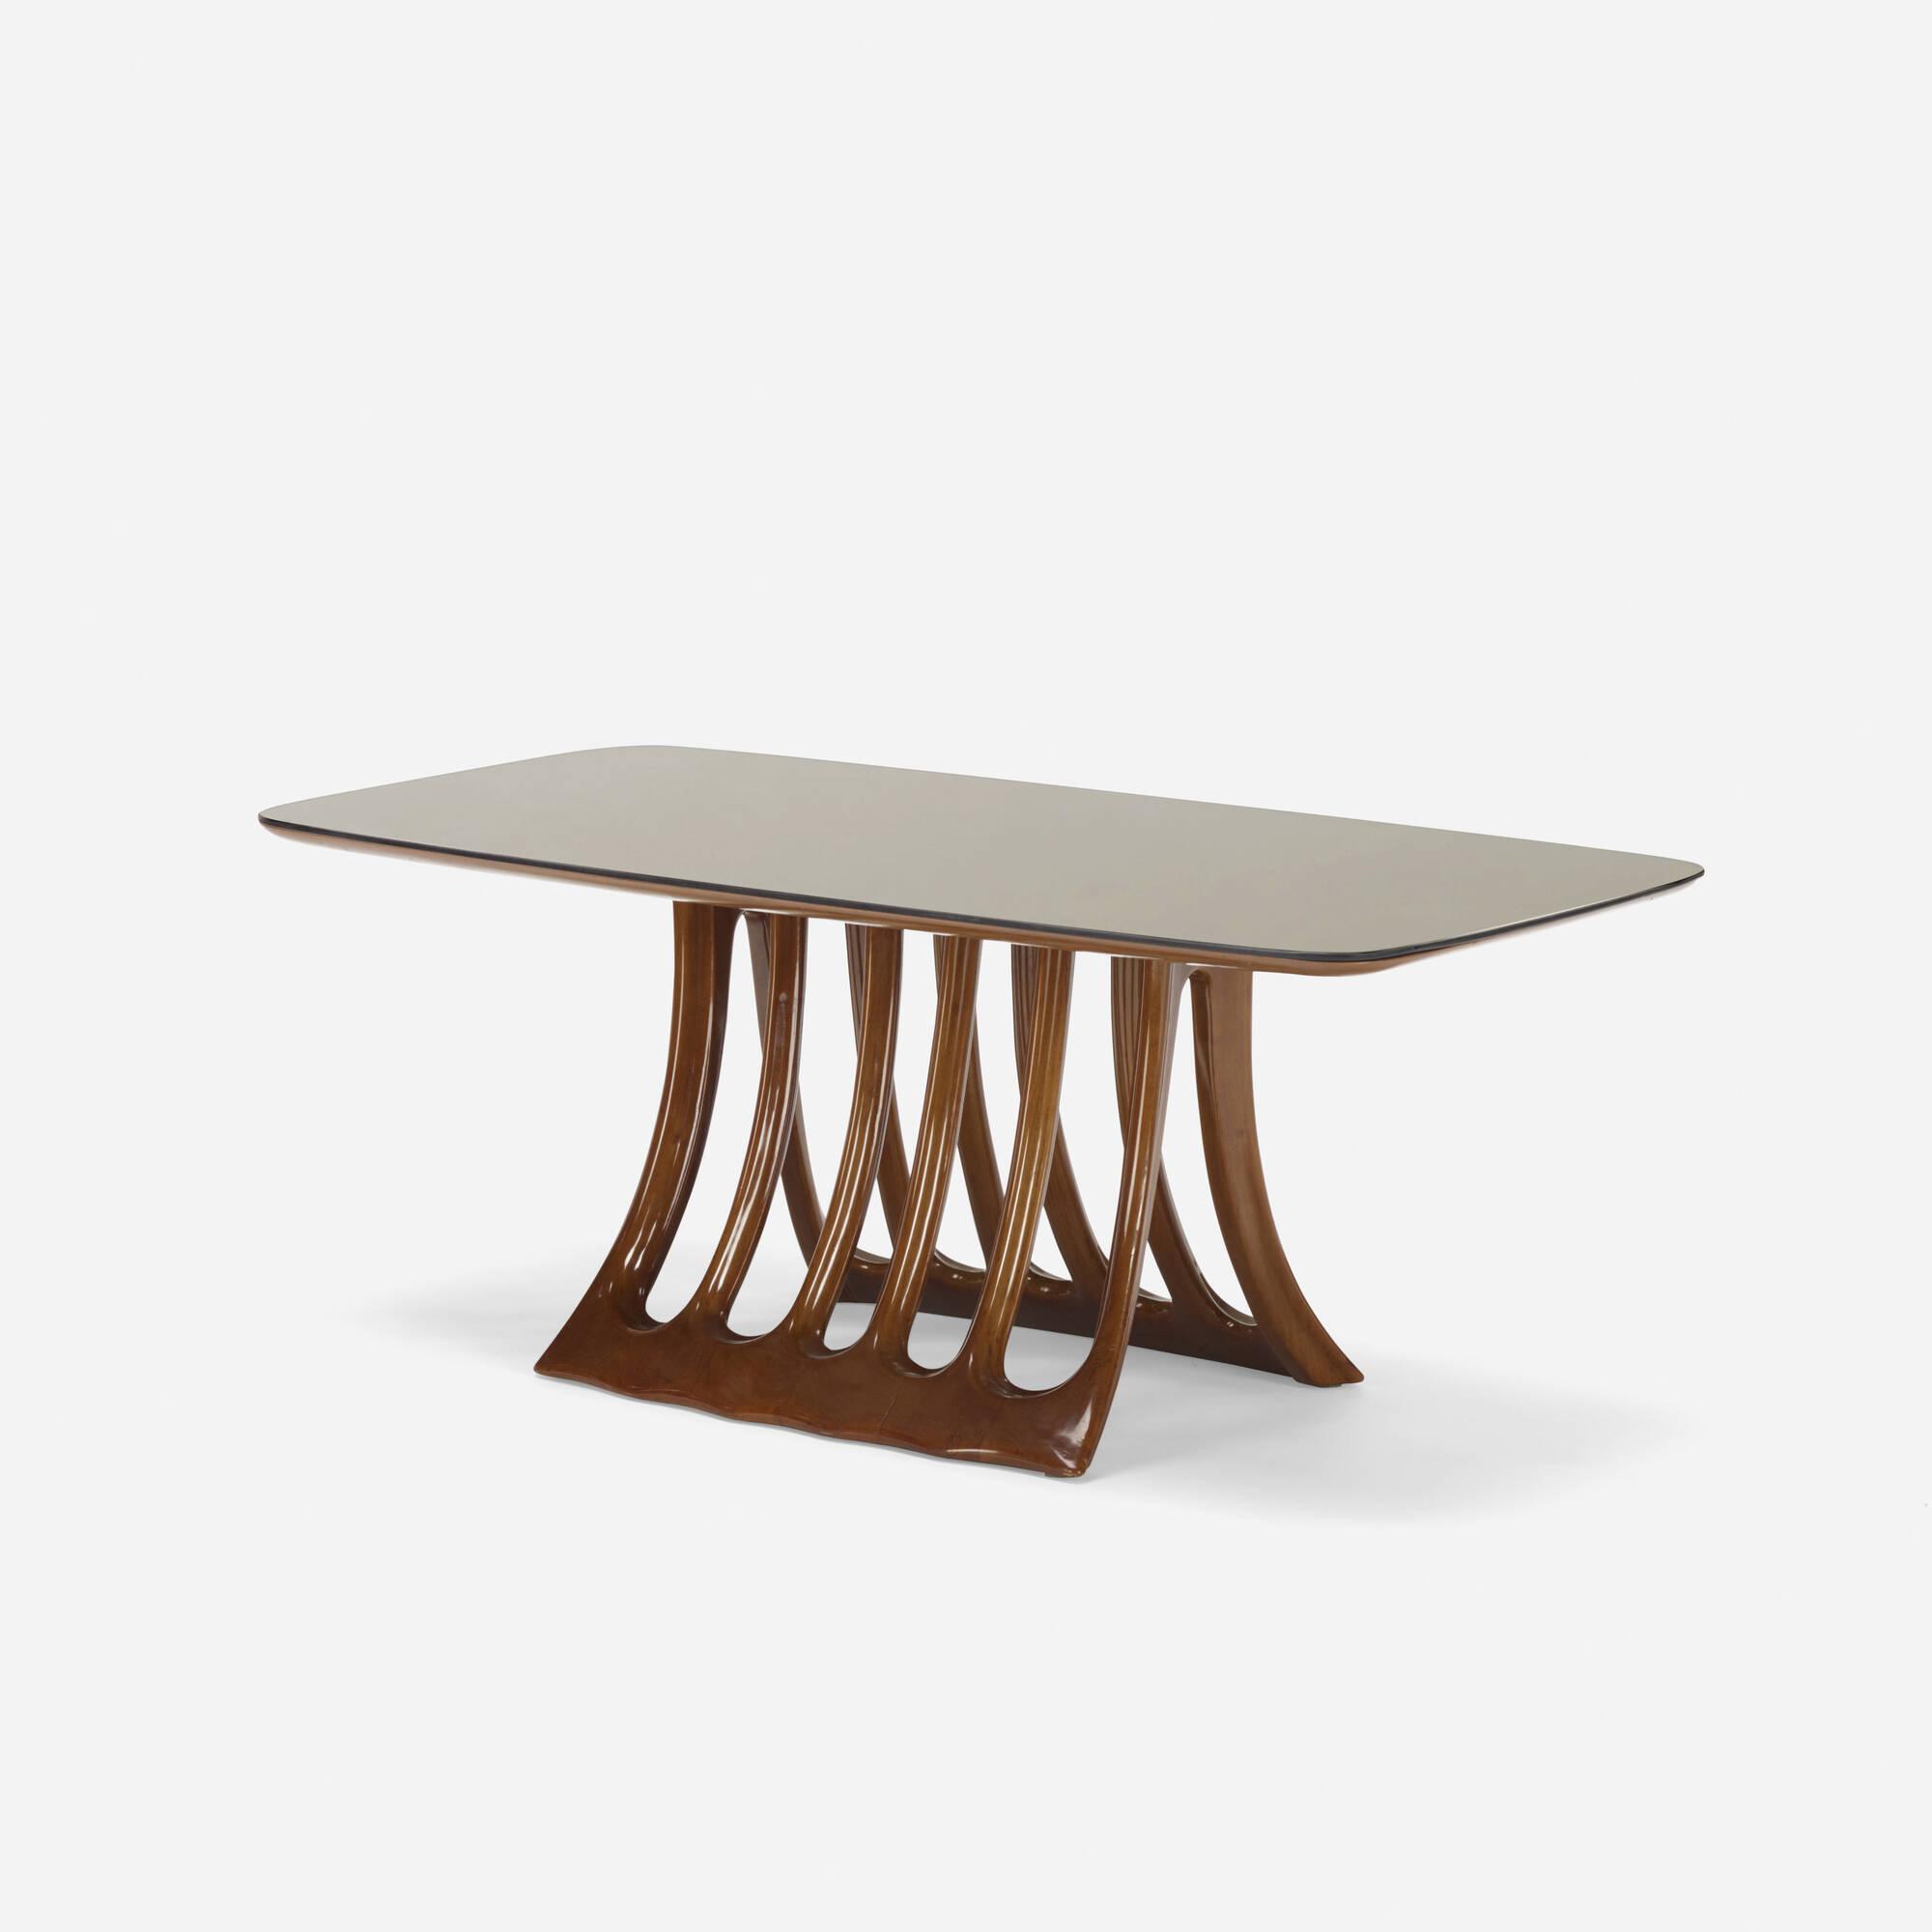 338: Osvaldo Borsani / coffee table (1 of 2)